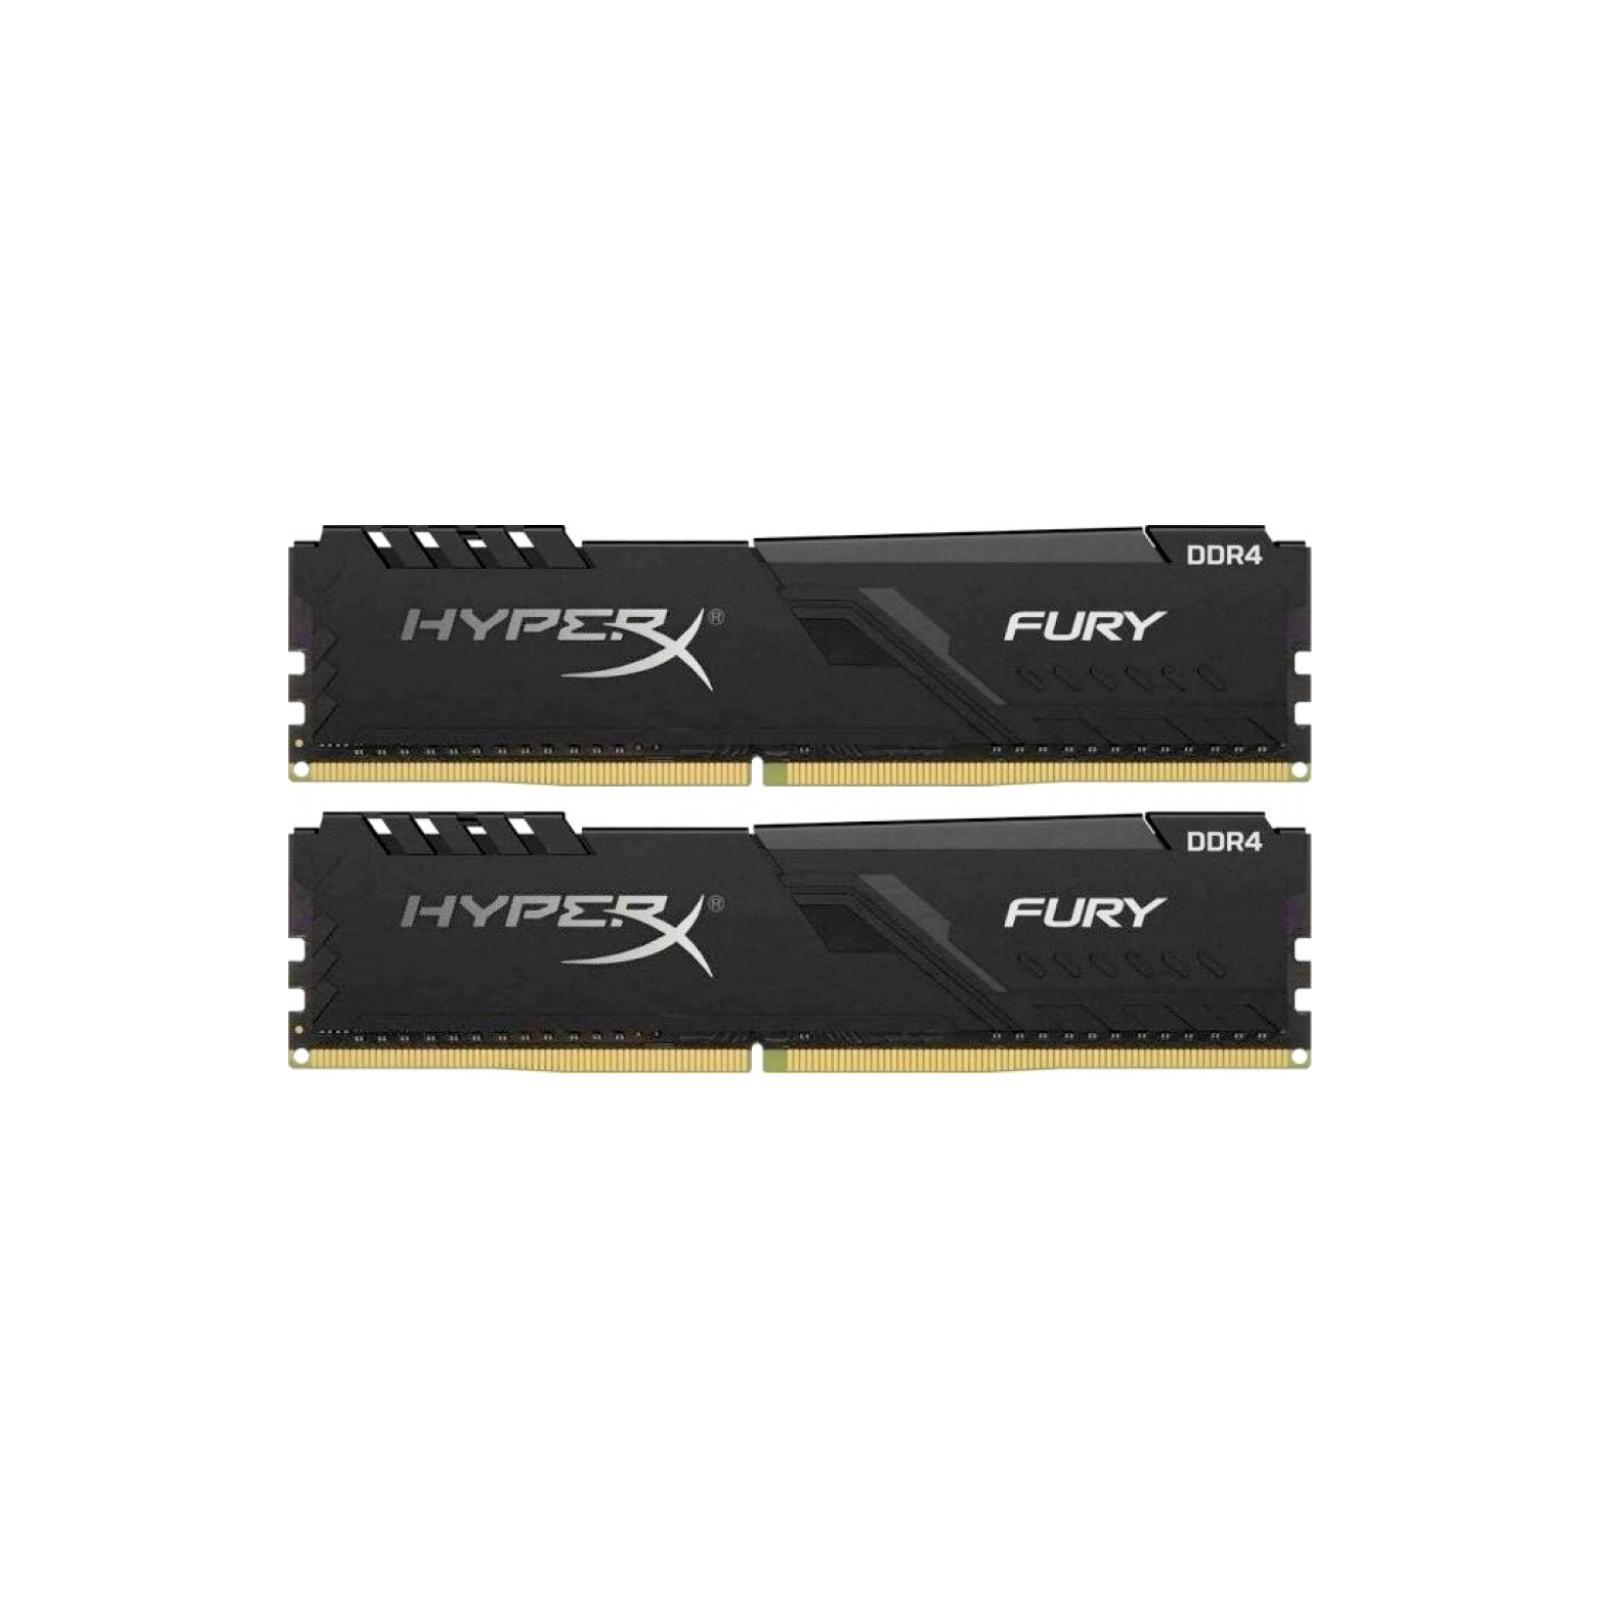 Модуль памяти для компьютера DDR4 8GB (2x4GB) 3200 MHz HyperX Fury Black HyperX (Kingston Fury) (HX432C16FB3K2/8)